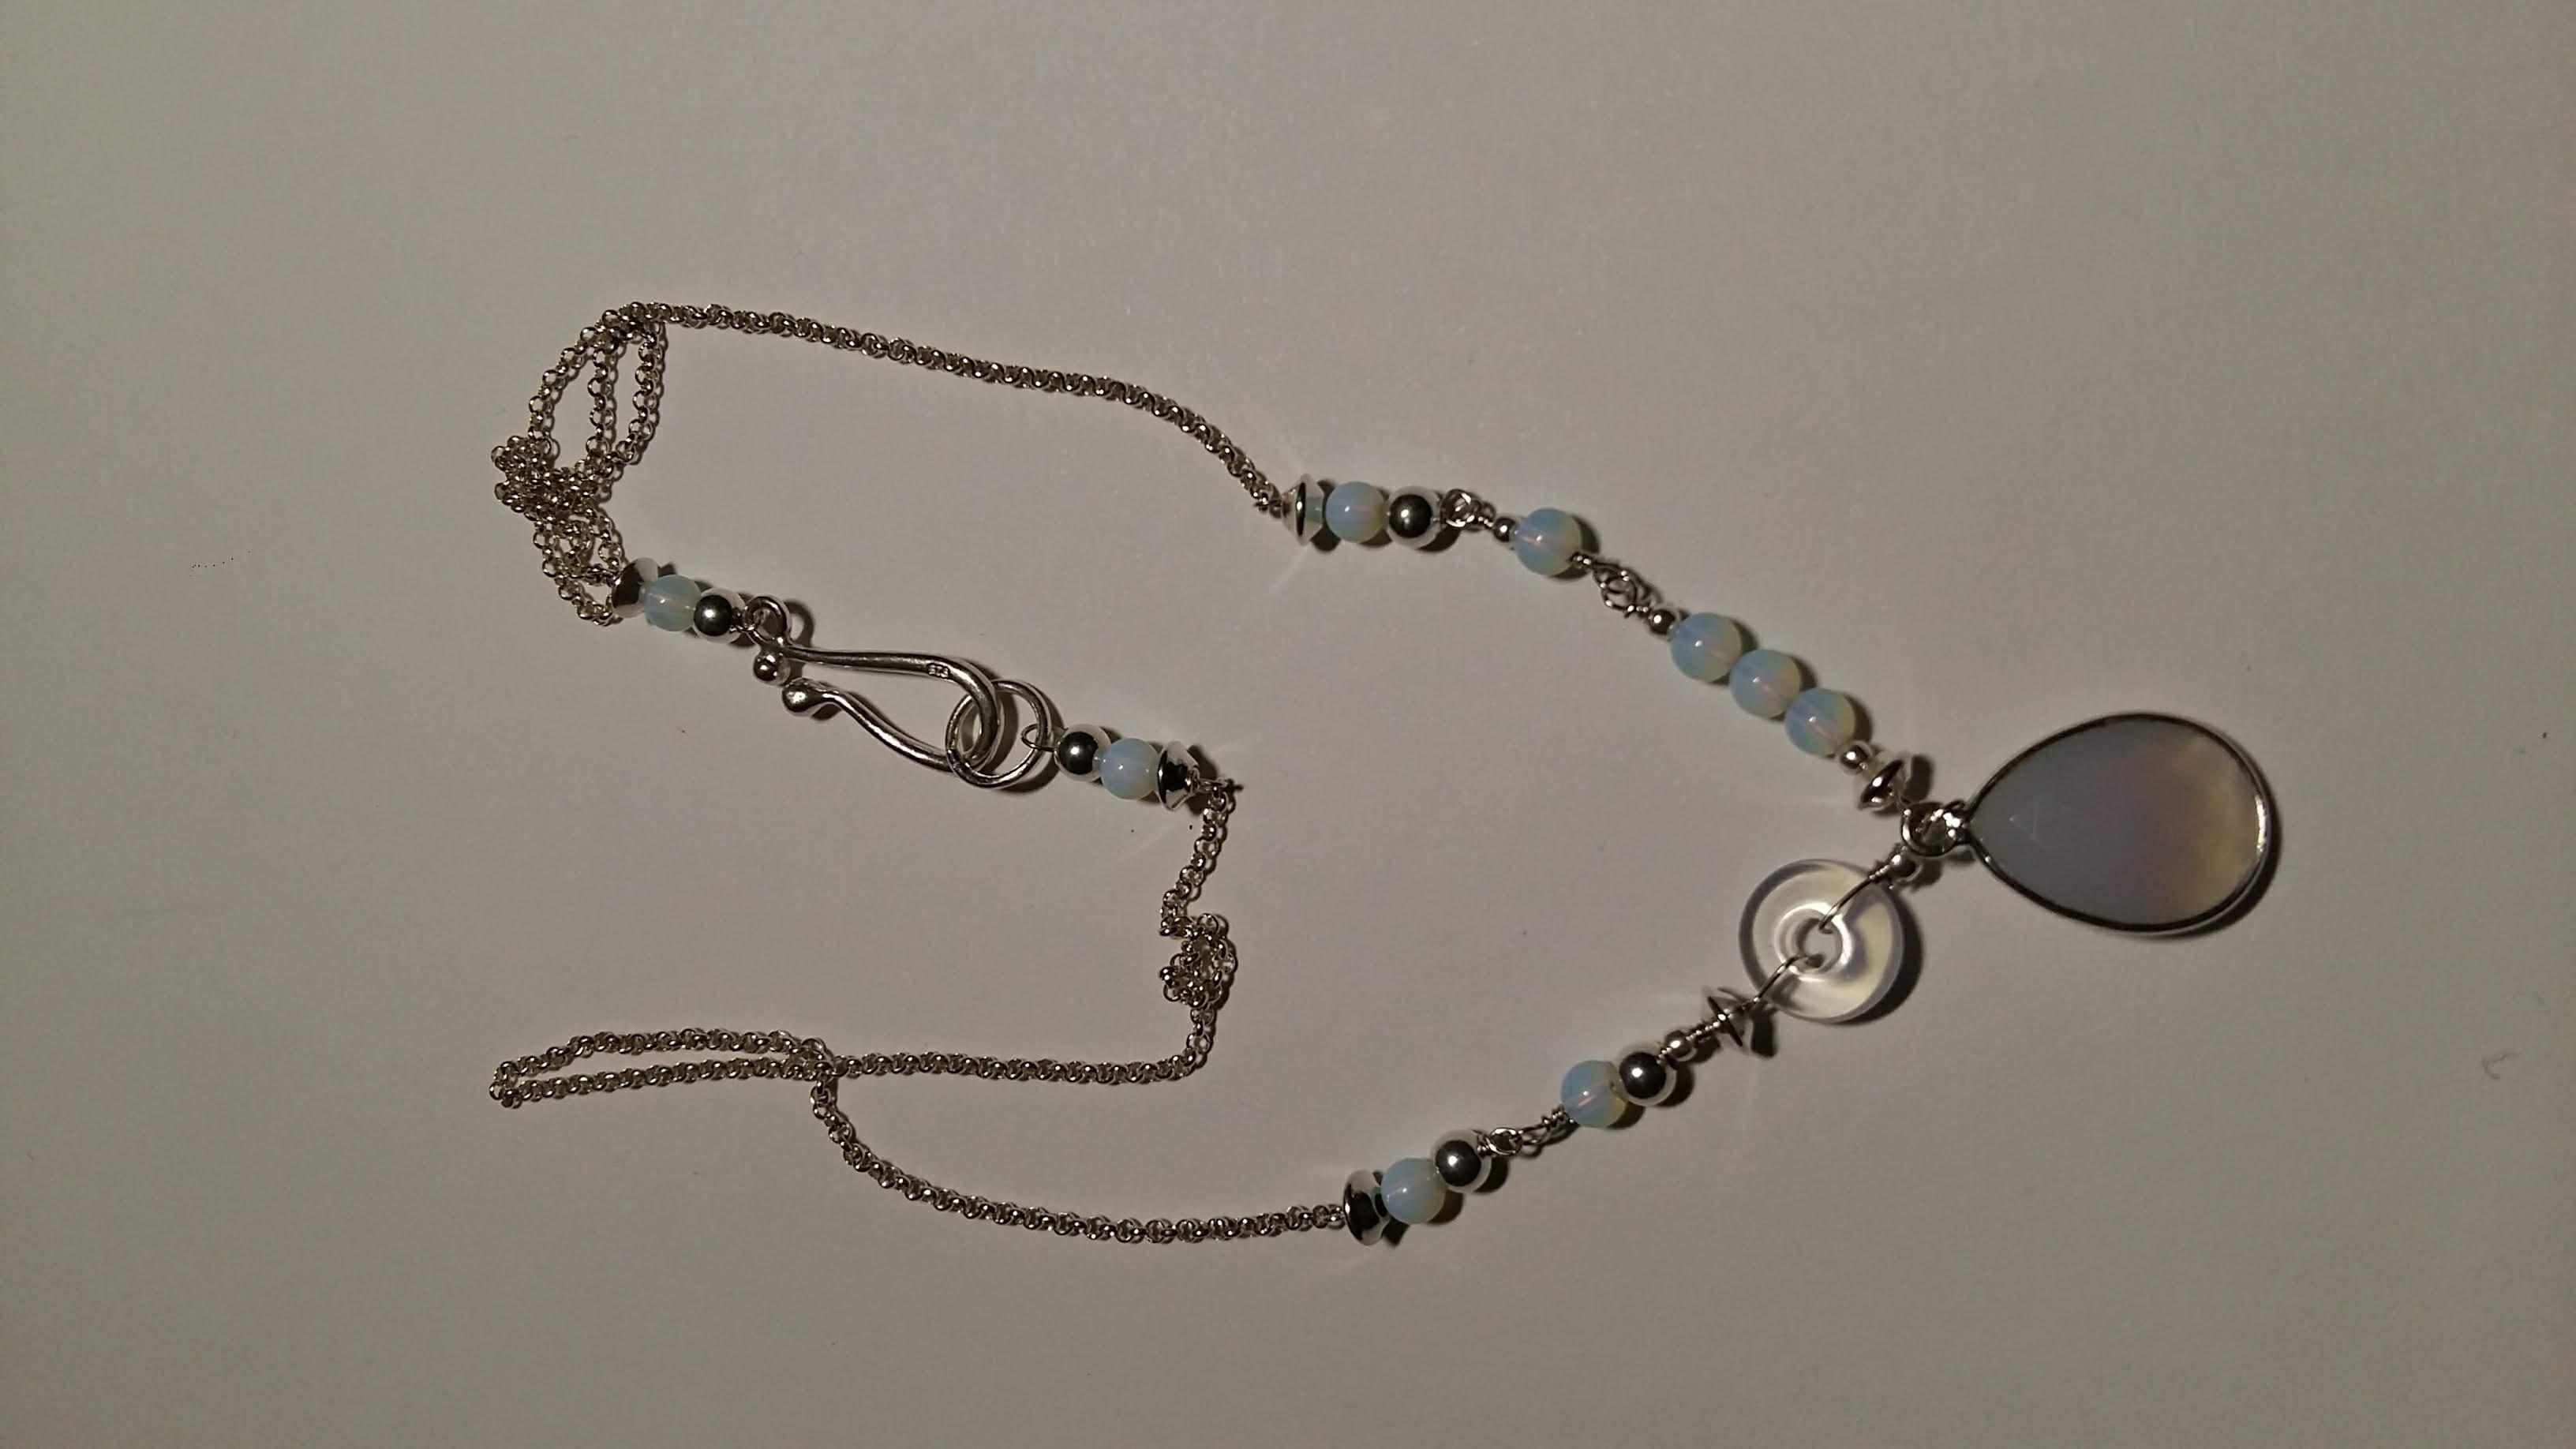 Halsjuweel, zilver, opaal(synth.))